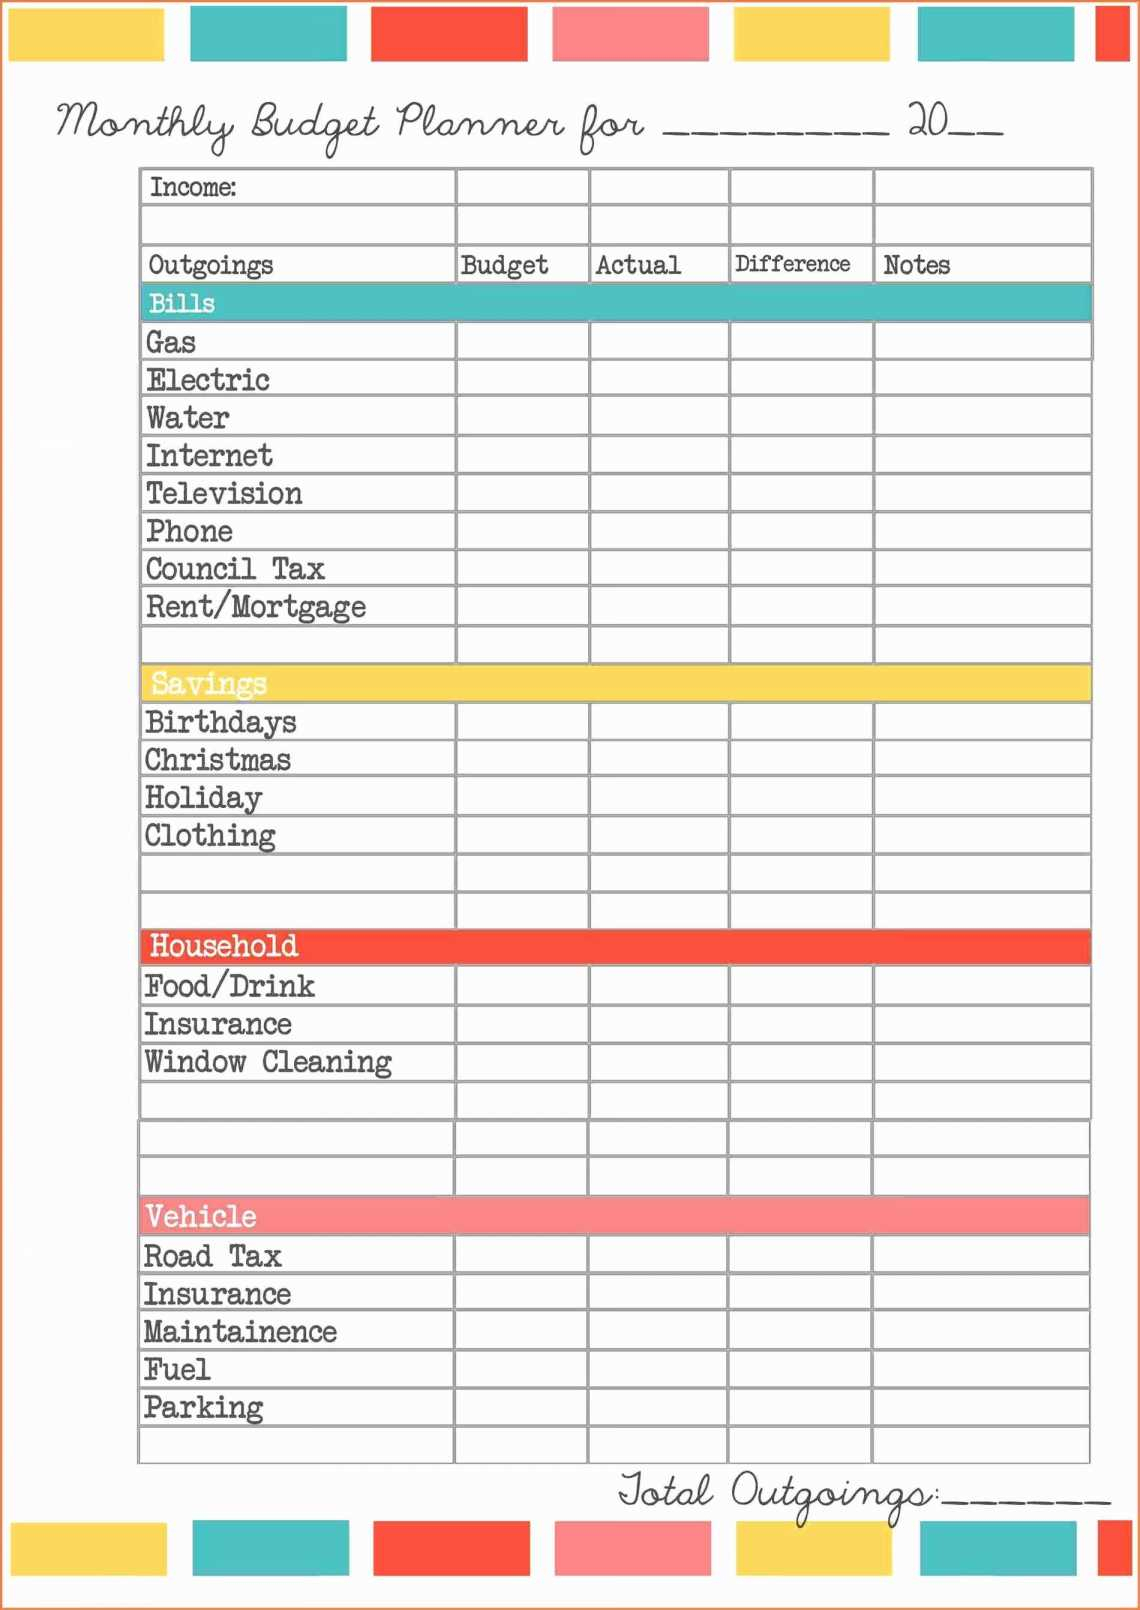 Church Accounting Spreadsheet Templates 50 Fresh Free Church And Accounting Worksheet Template Excel